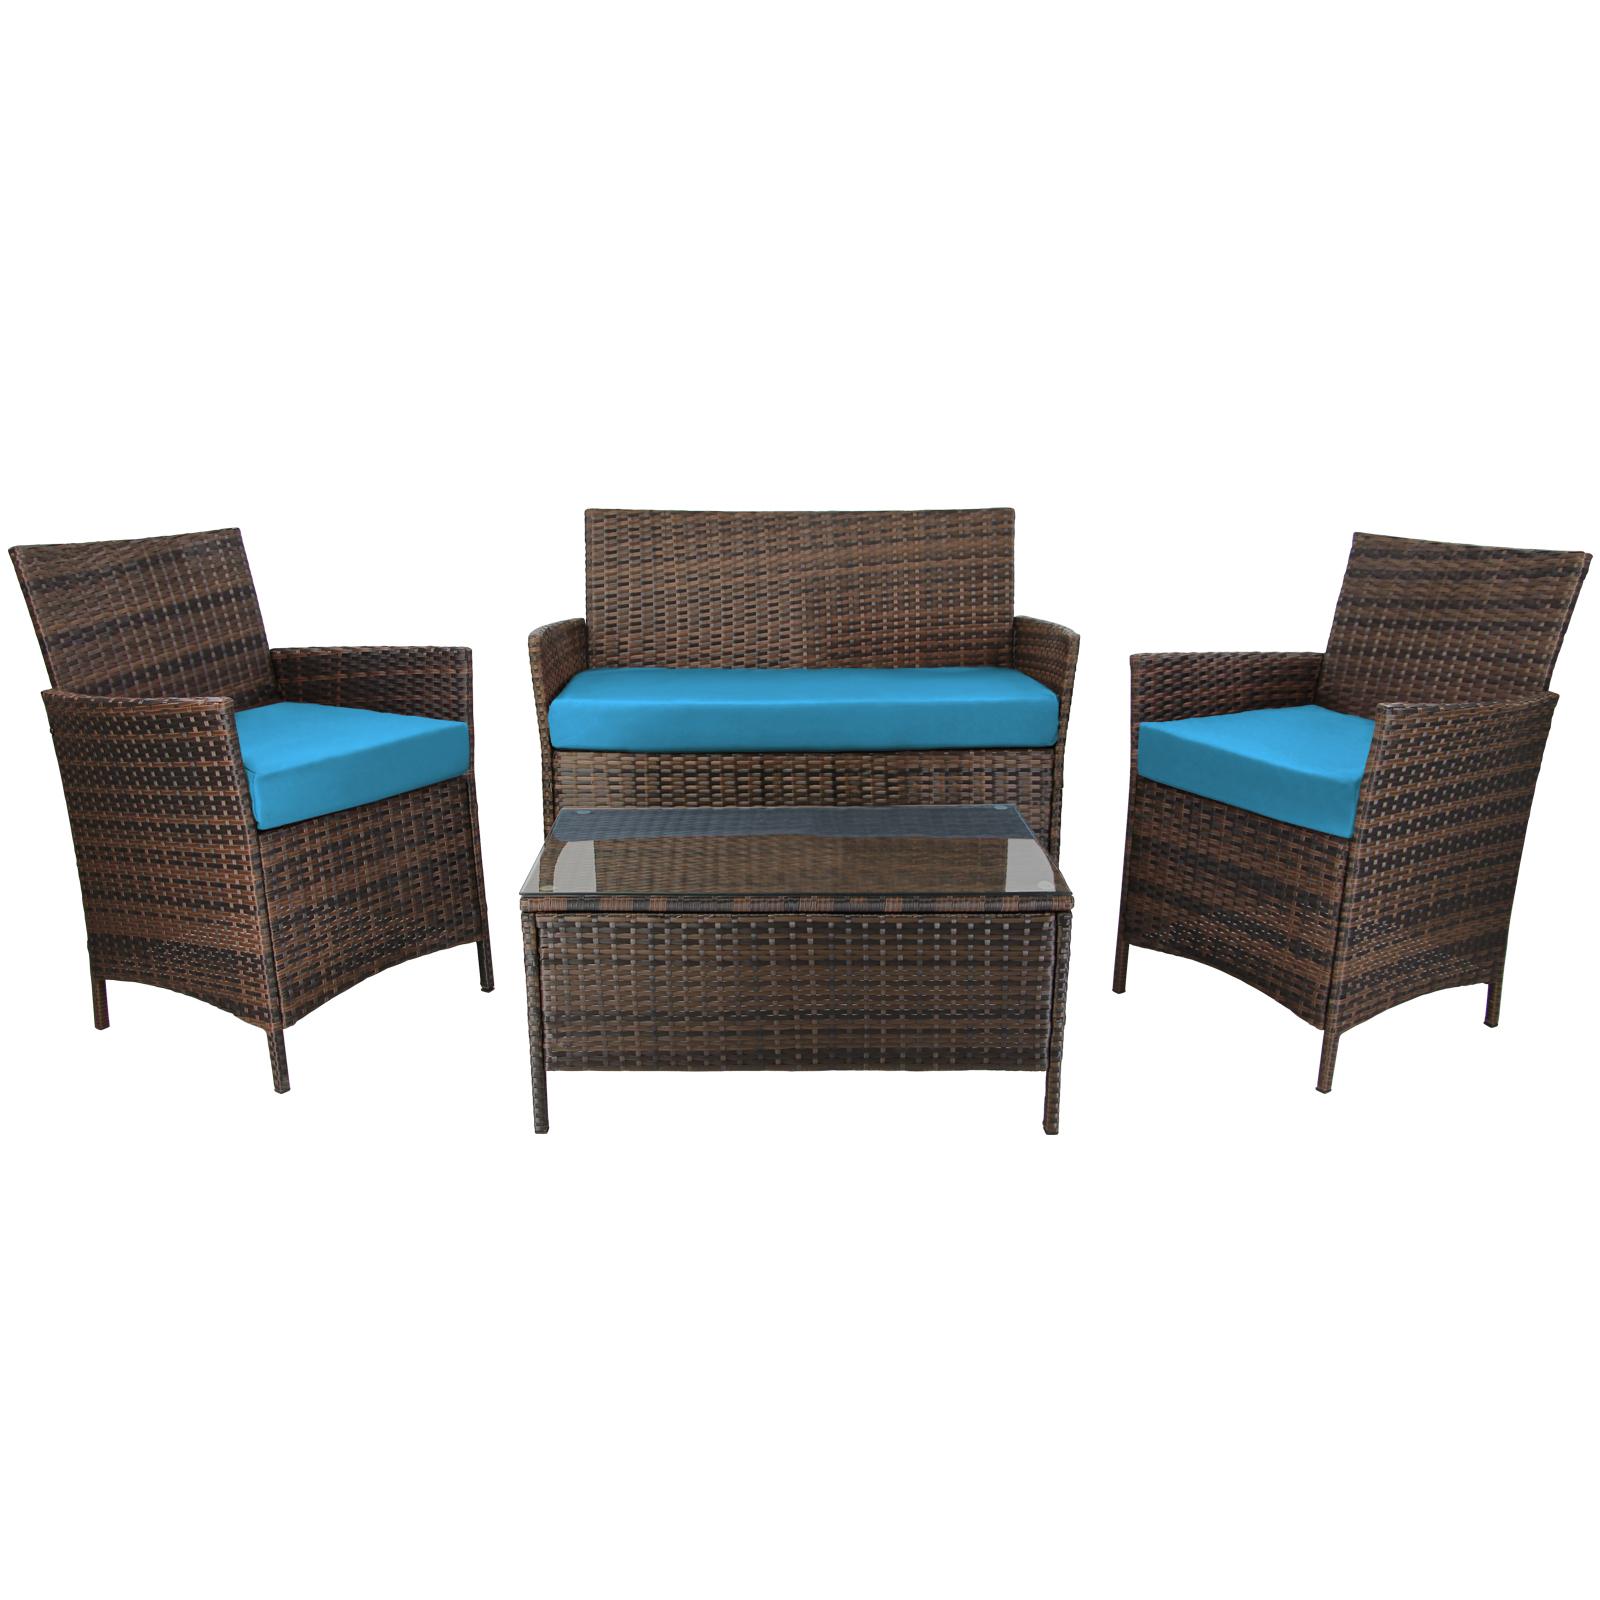 7 teilige rattan sitzgruppe lounge kuba von bb sport. Black Bedroom Furniture Sets. Home Design Ideas